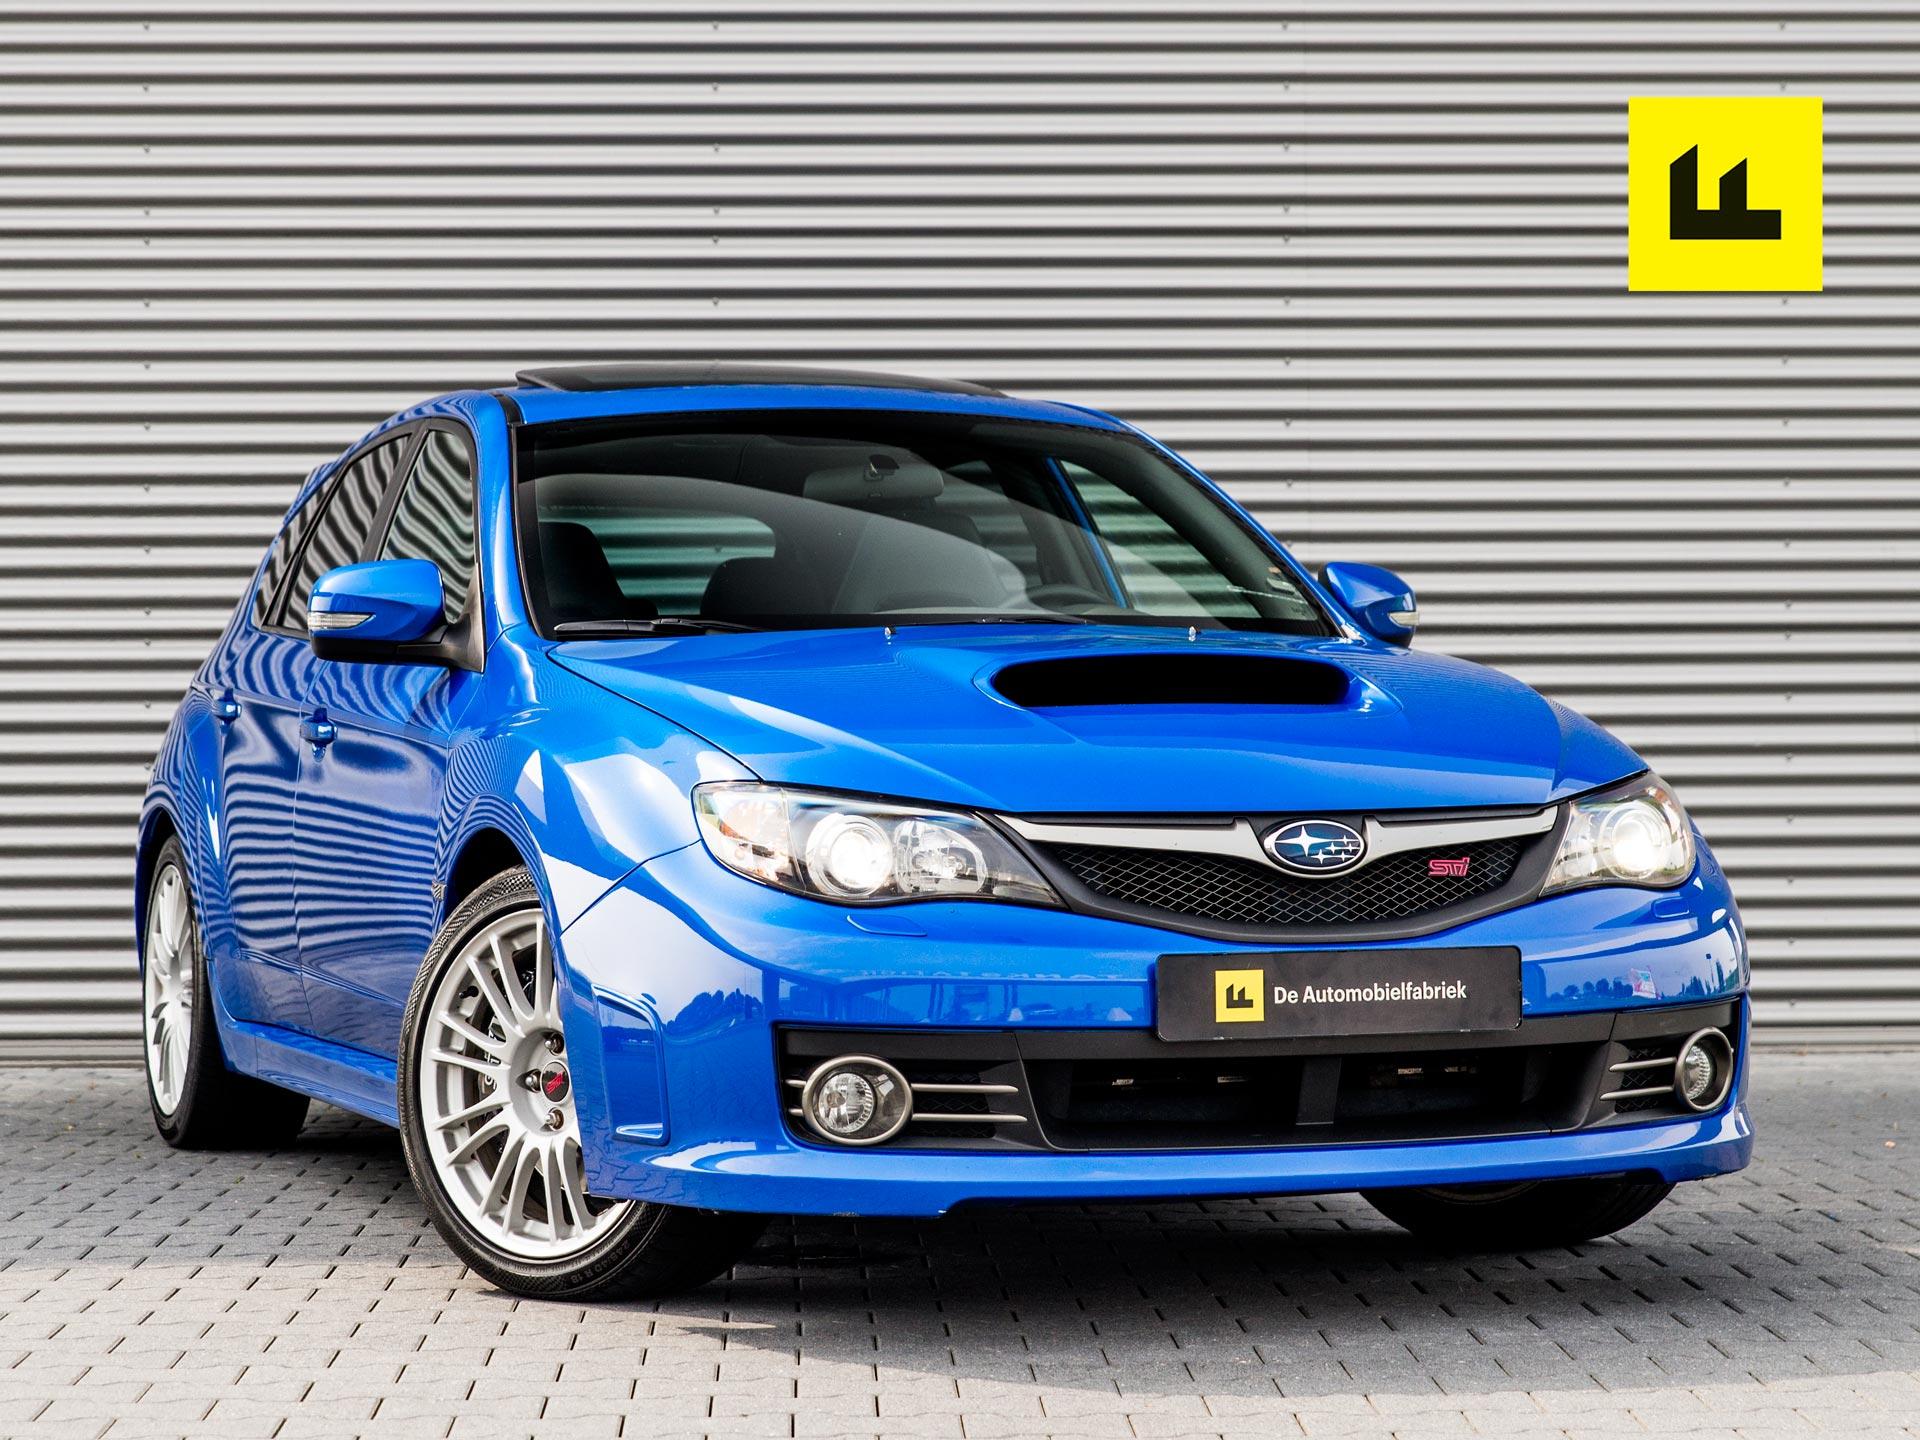 Tweedehands Subaru Impreza WRX STI uit 2008, occasion